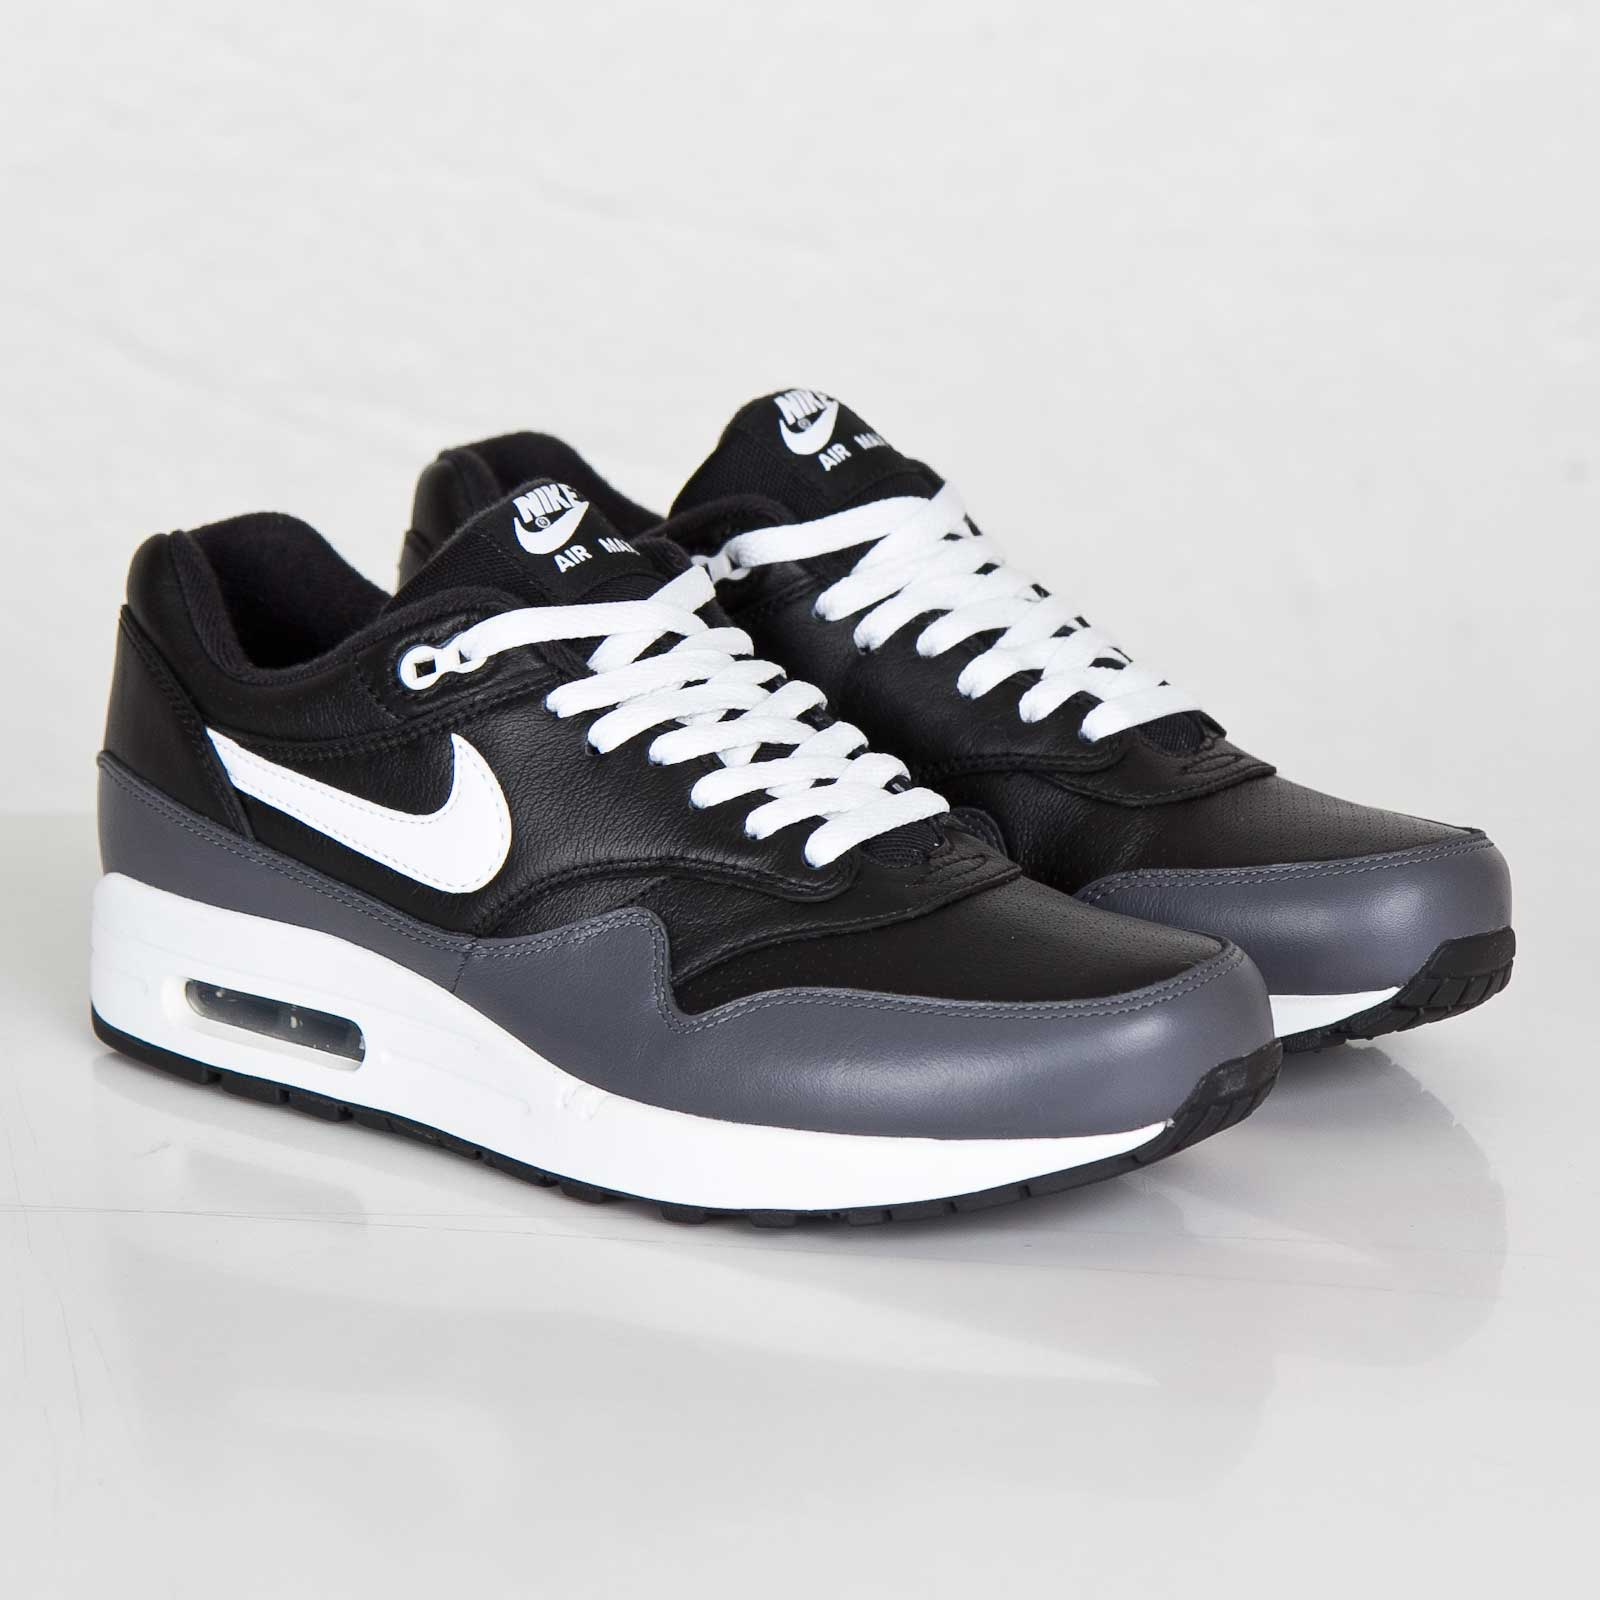 Nike Air Max 1 LTR - 654466-001 - SNS | sneakers & streetwear ...